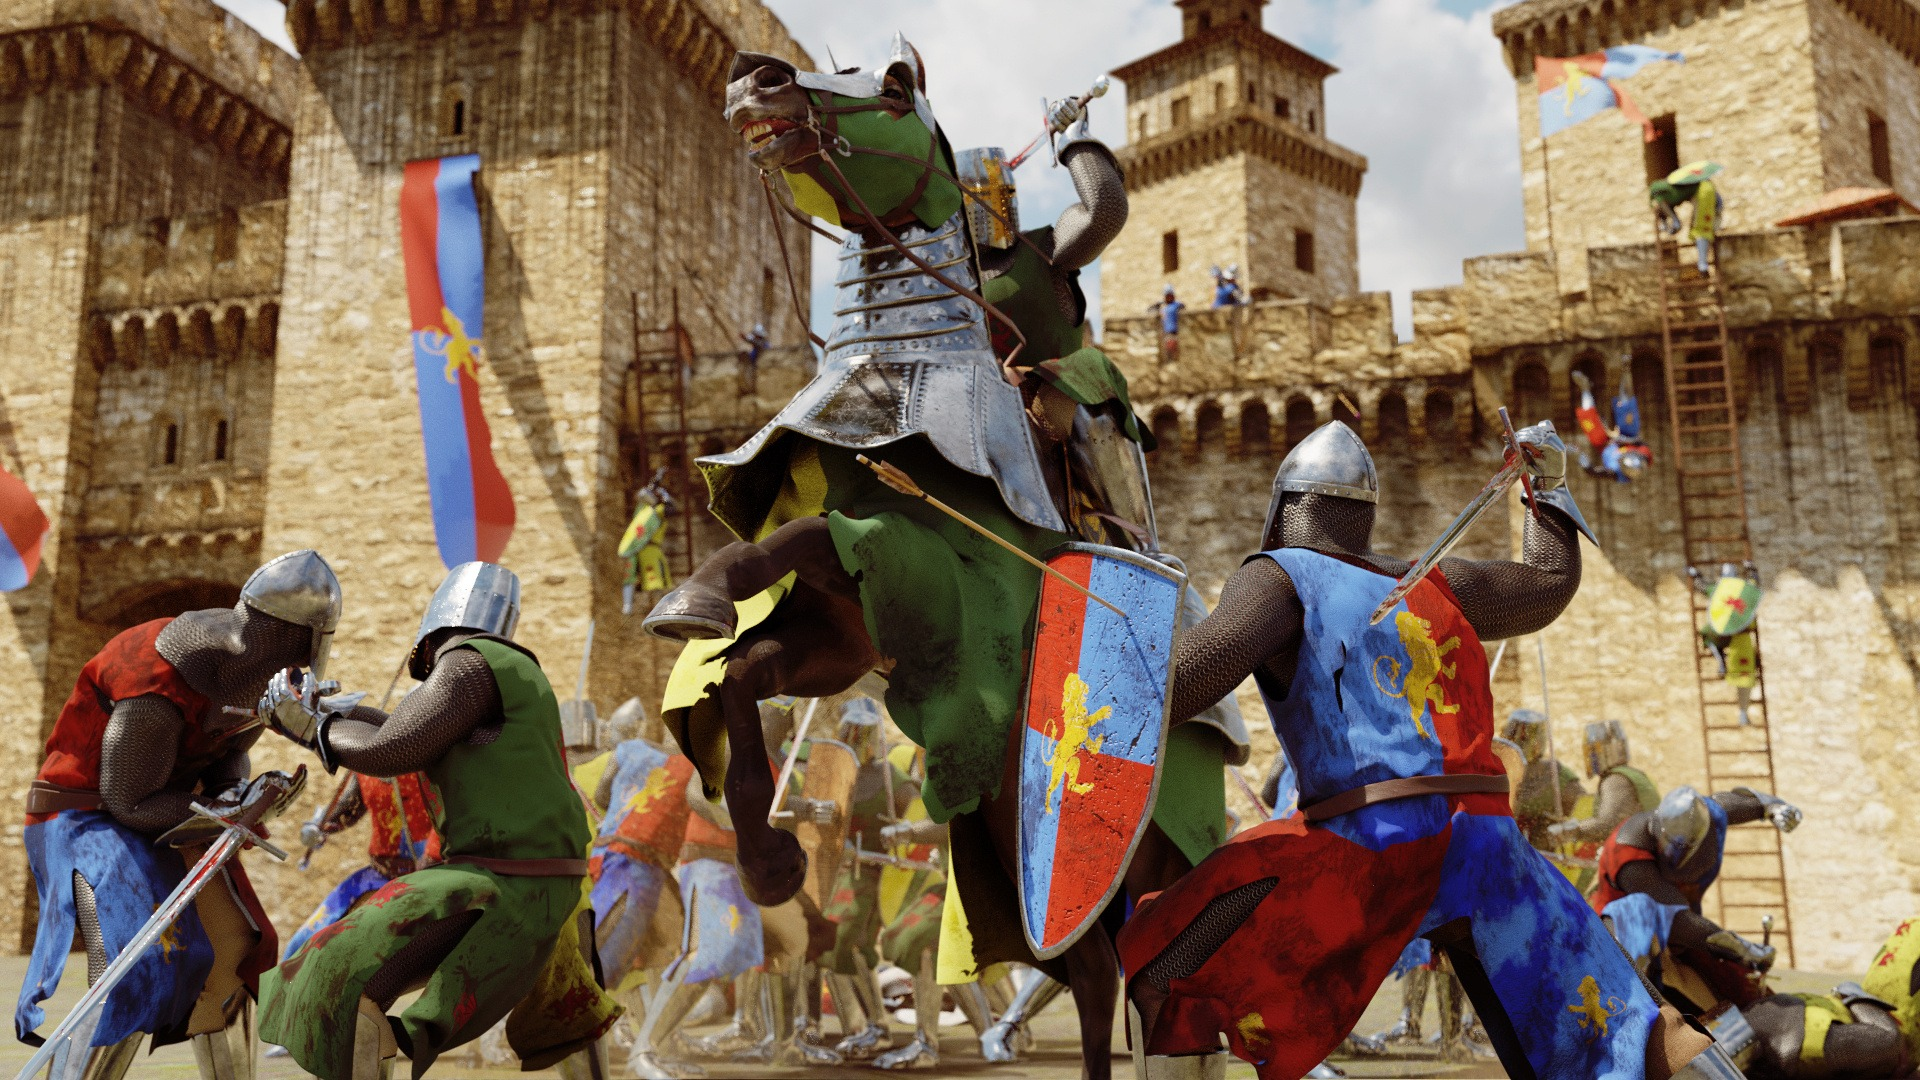 battaglia-medievale1